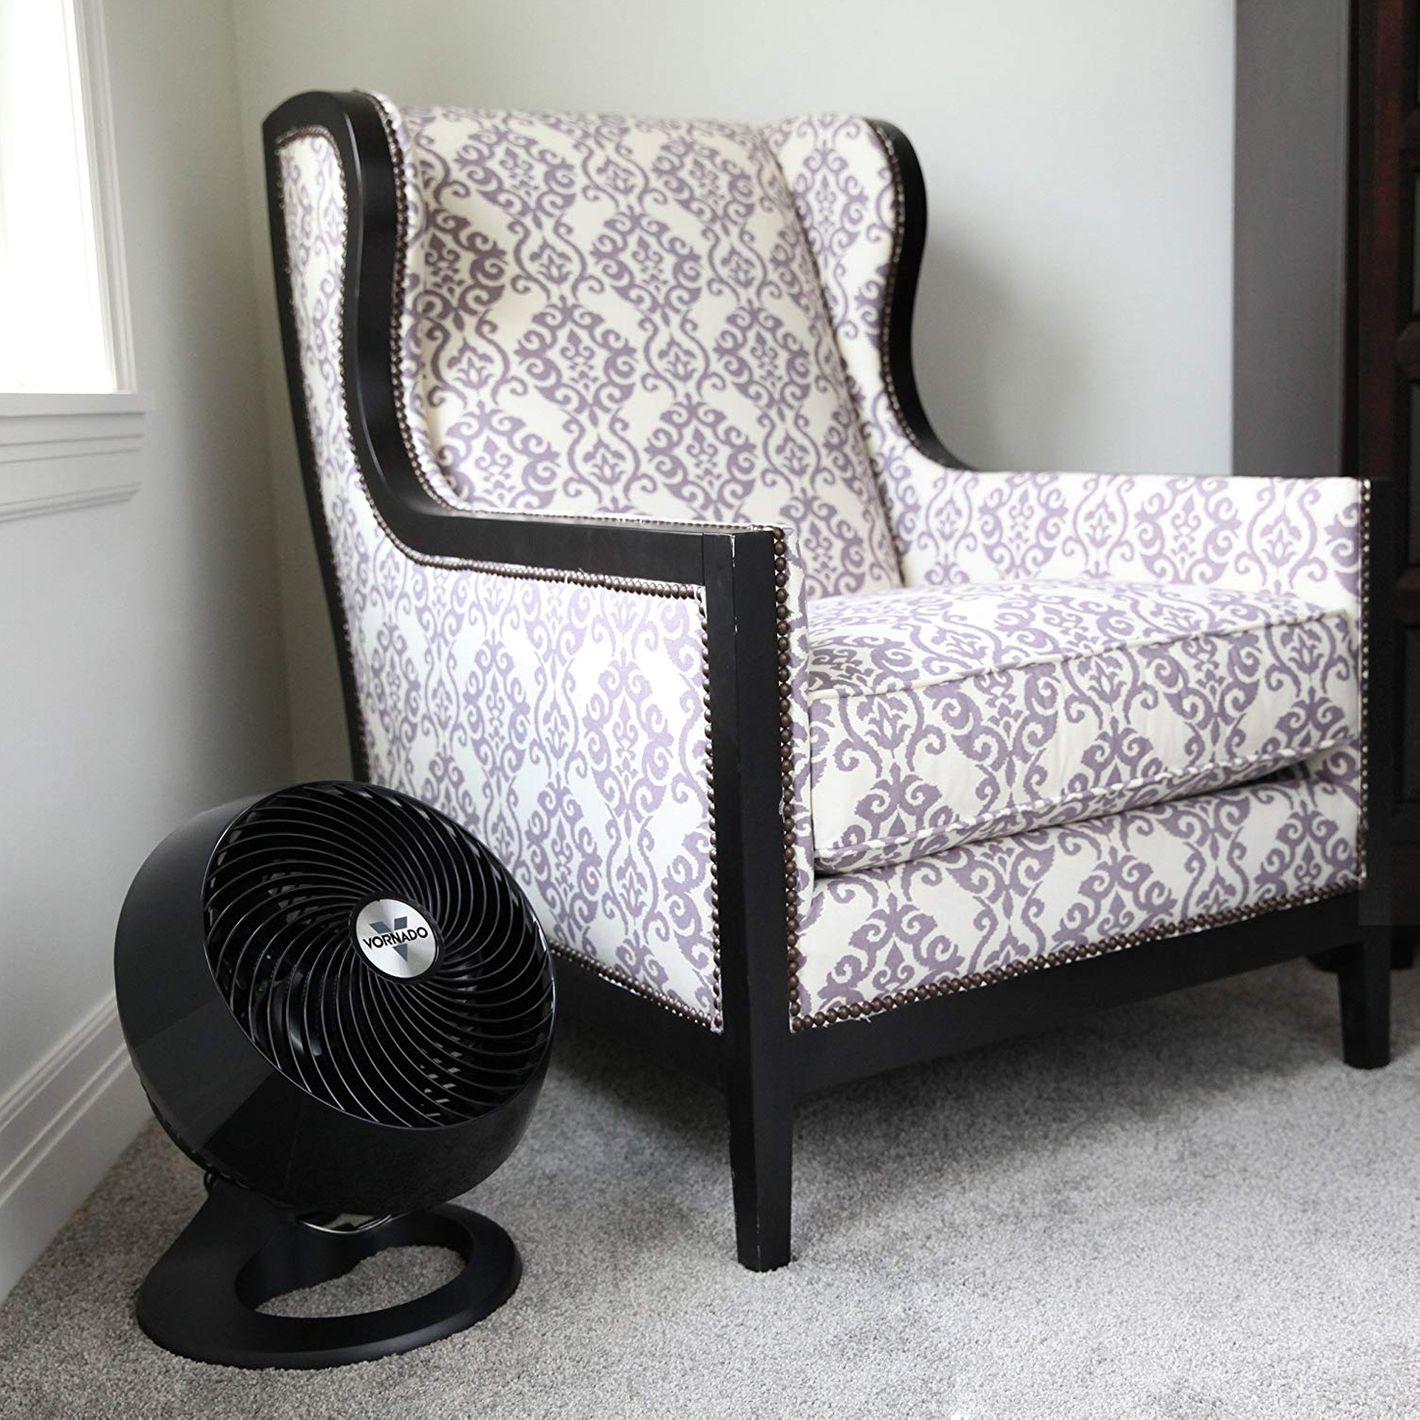 Vornado CR1-0121-06 660 Large Whole Room Air Circulator Fan, Black